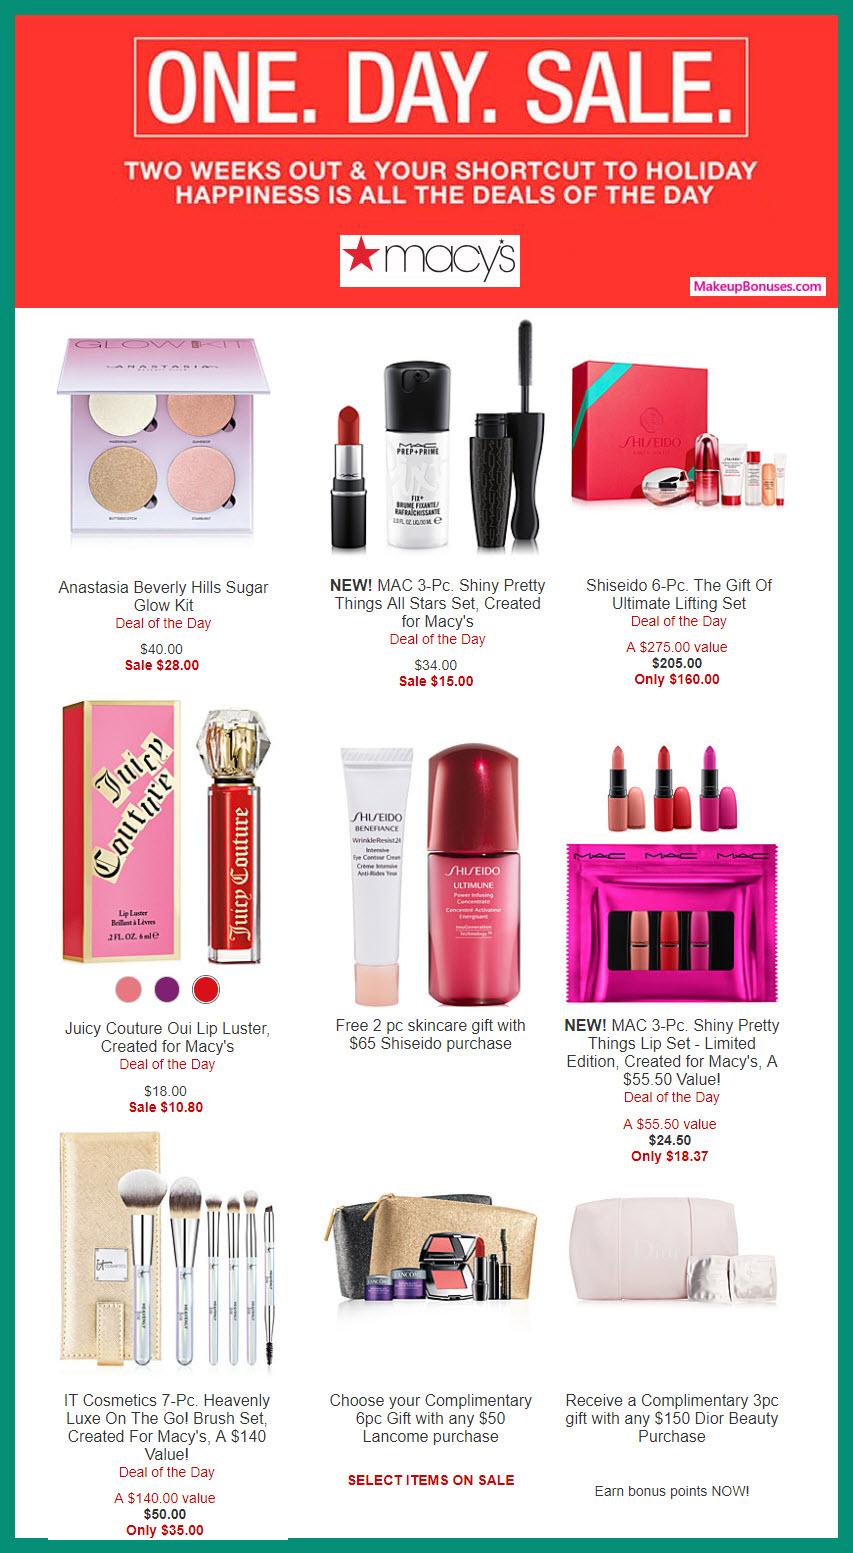 Beauty Deals incl #MACYS 1-day Sale #ABHcosmetics #benefitcosmetics #Dior #itcosmetics #JuicyCouture #lancomeUS #MACcosmetics #ShiseidoUSA #SmashboxCosmetics #tartecosmetics #UrbanDecayCosmetics